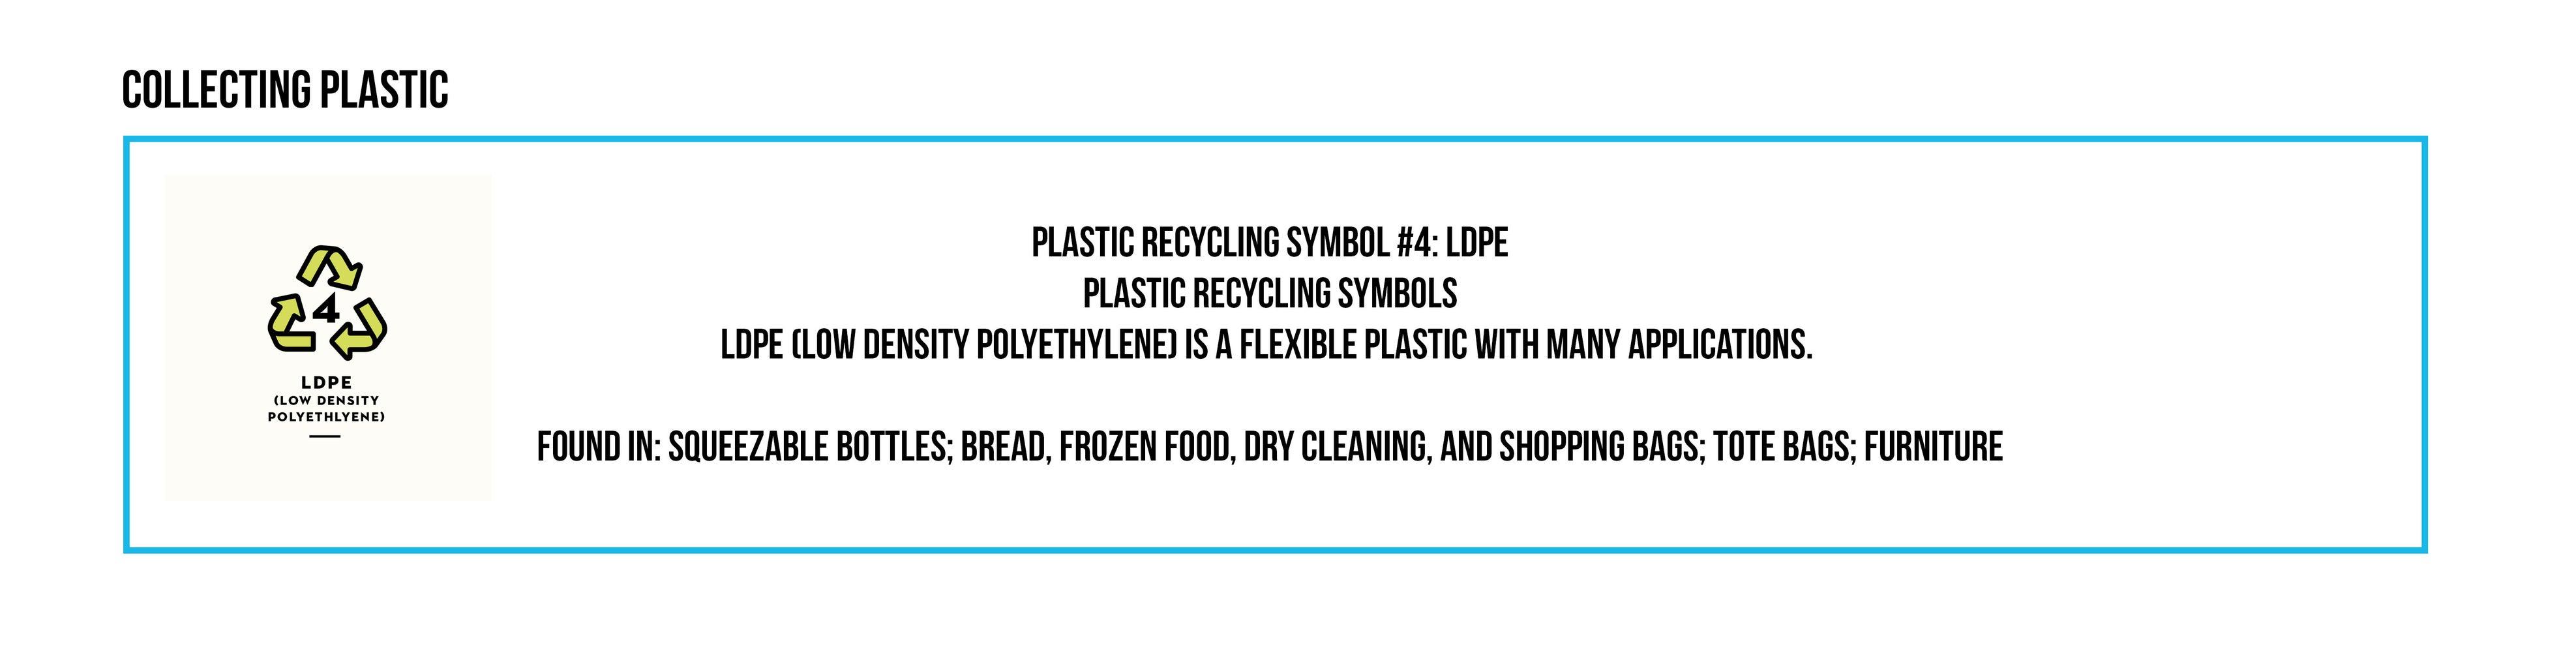 Collecting Plastic